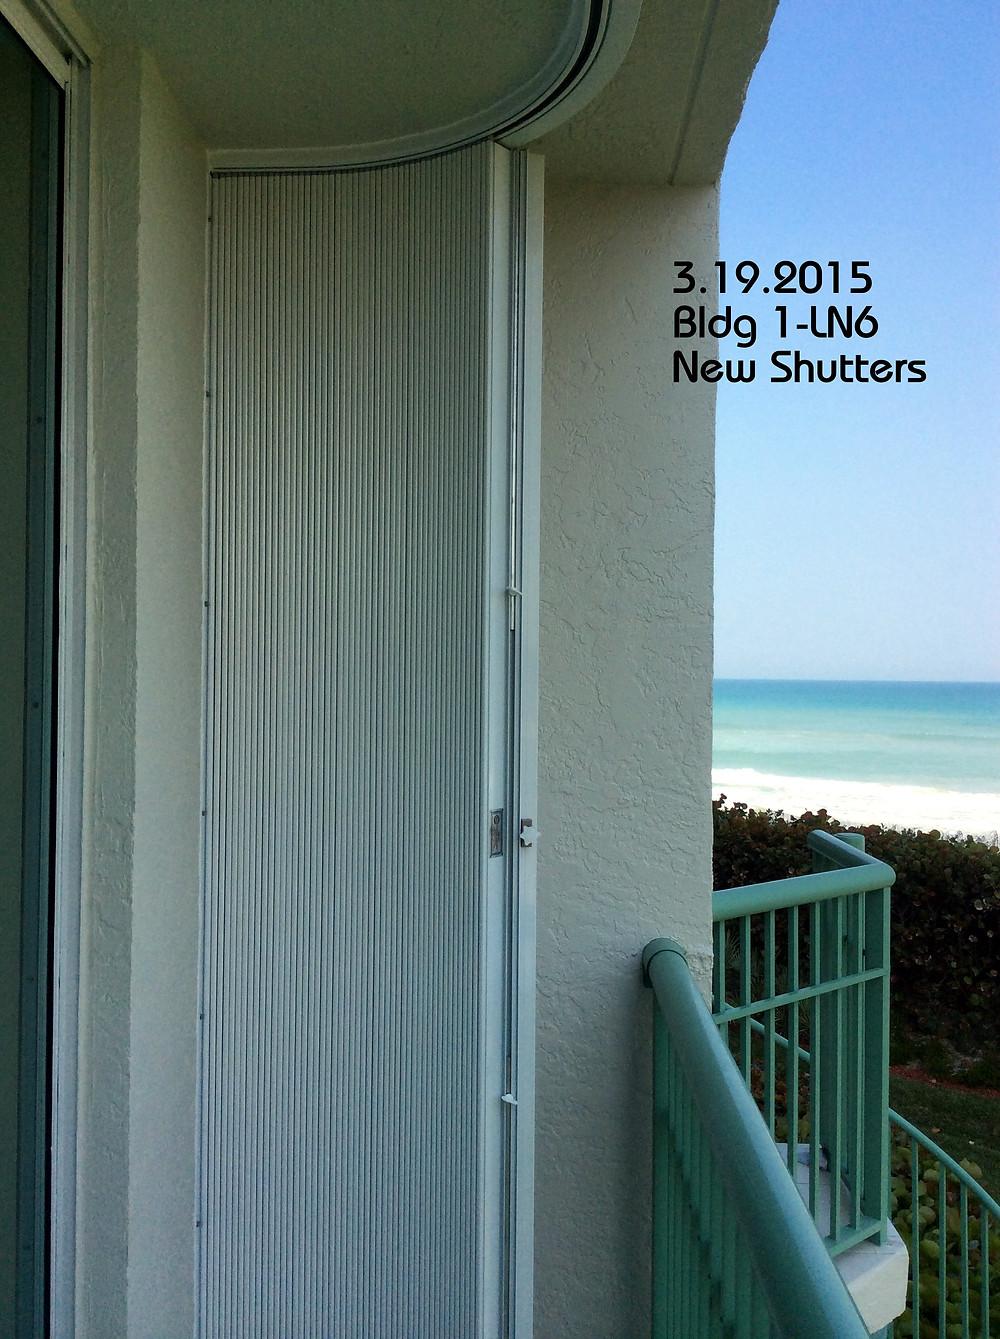 New Shutters on B.1..LN6.jpg